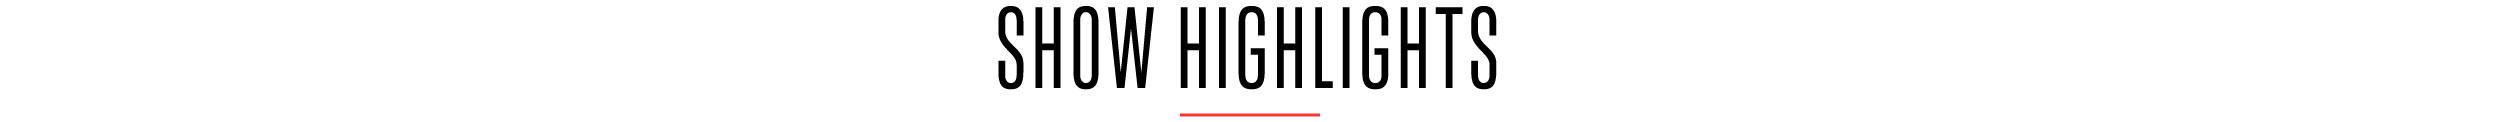 Blog-Show-Highlights.jpg